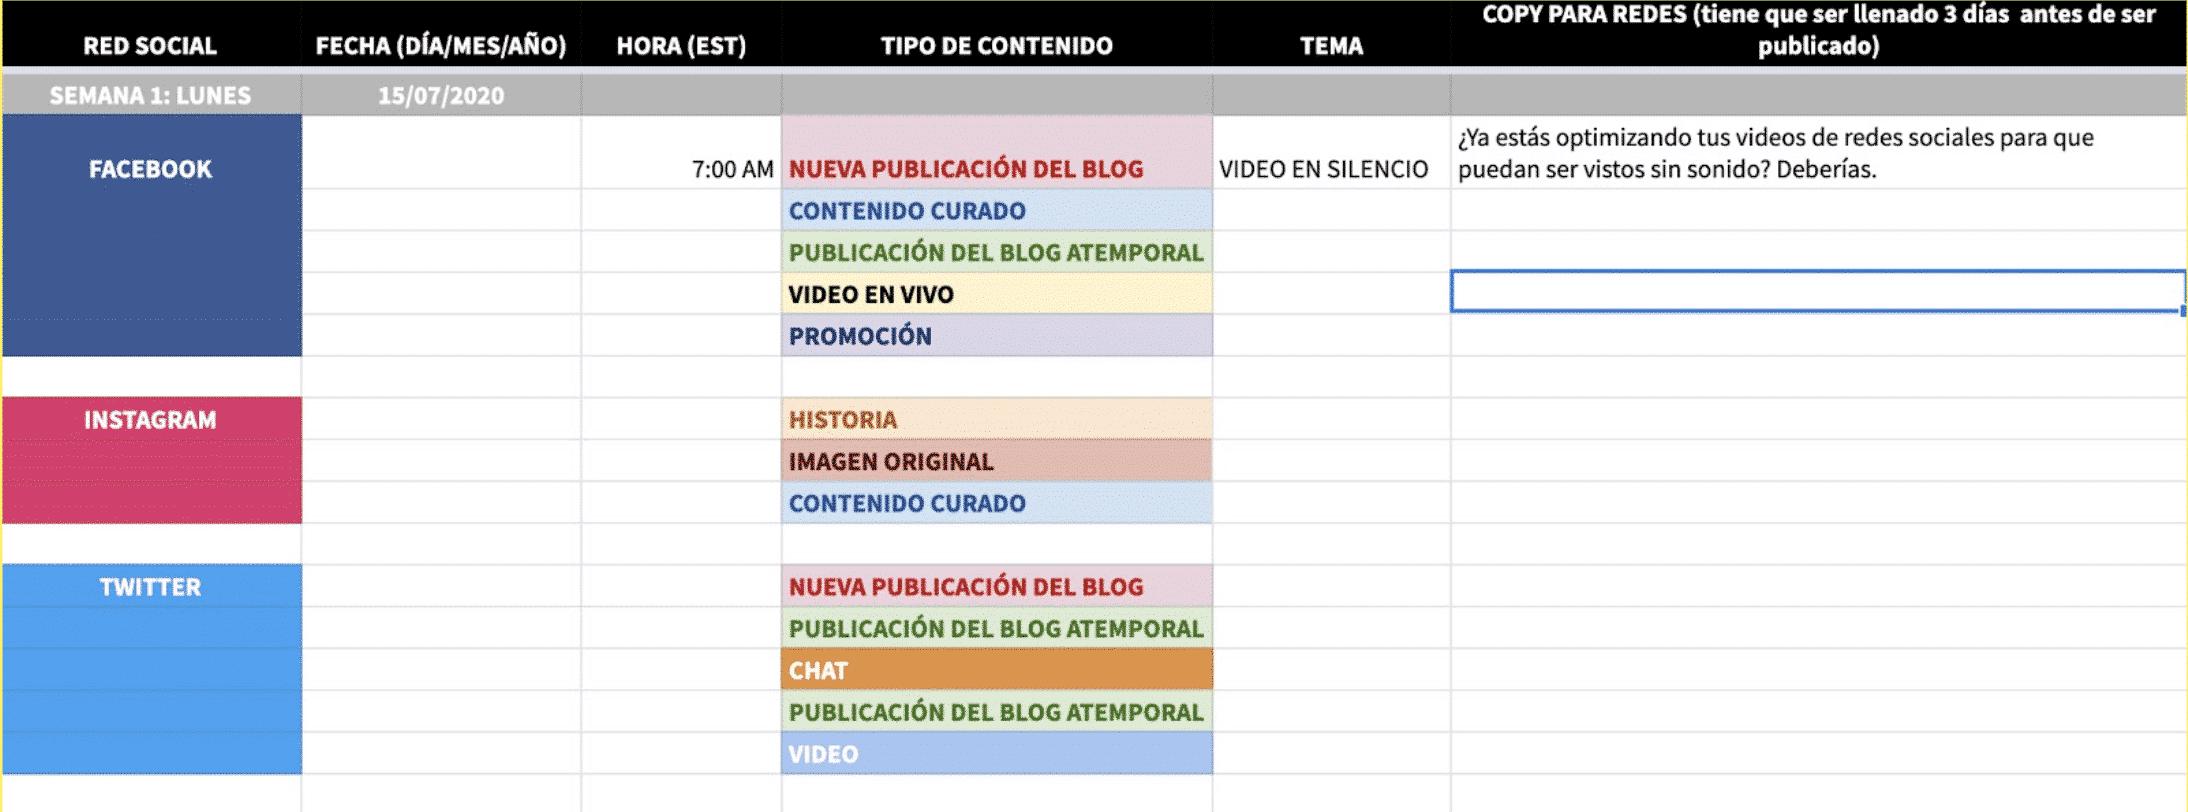 Plantilla para crear un calendario de contenido para redes sociales